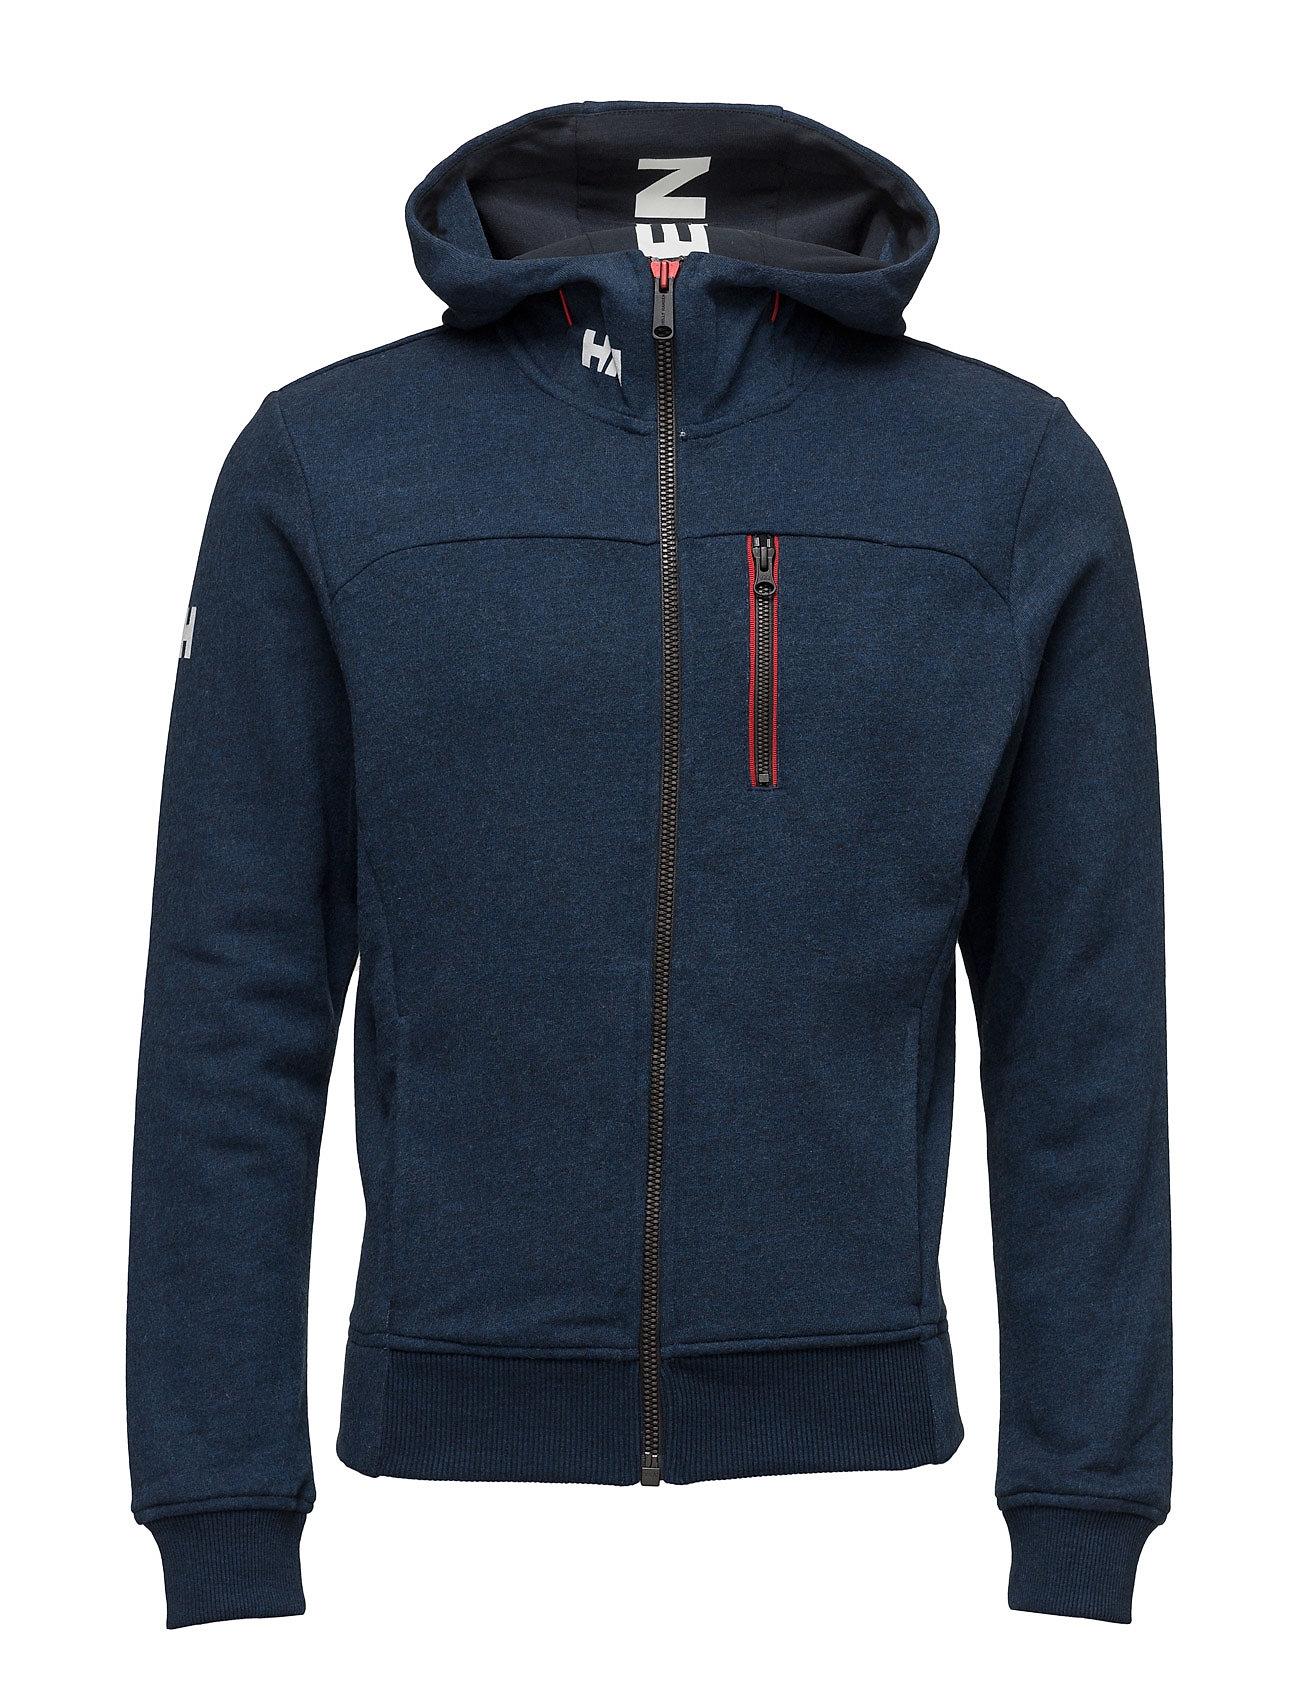 Crew Fz Hoodie Helly Hansen Sports sweatshirts til Herrer i